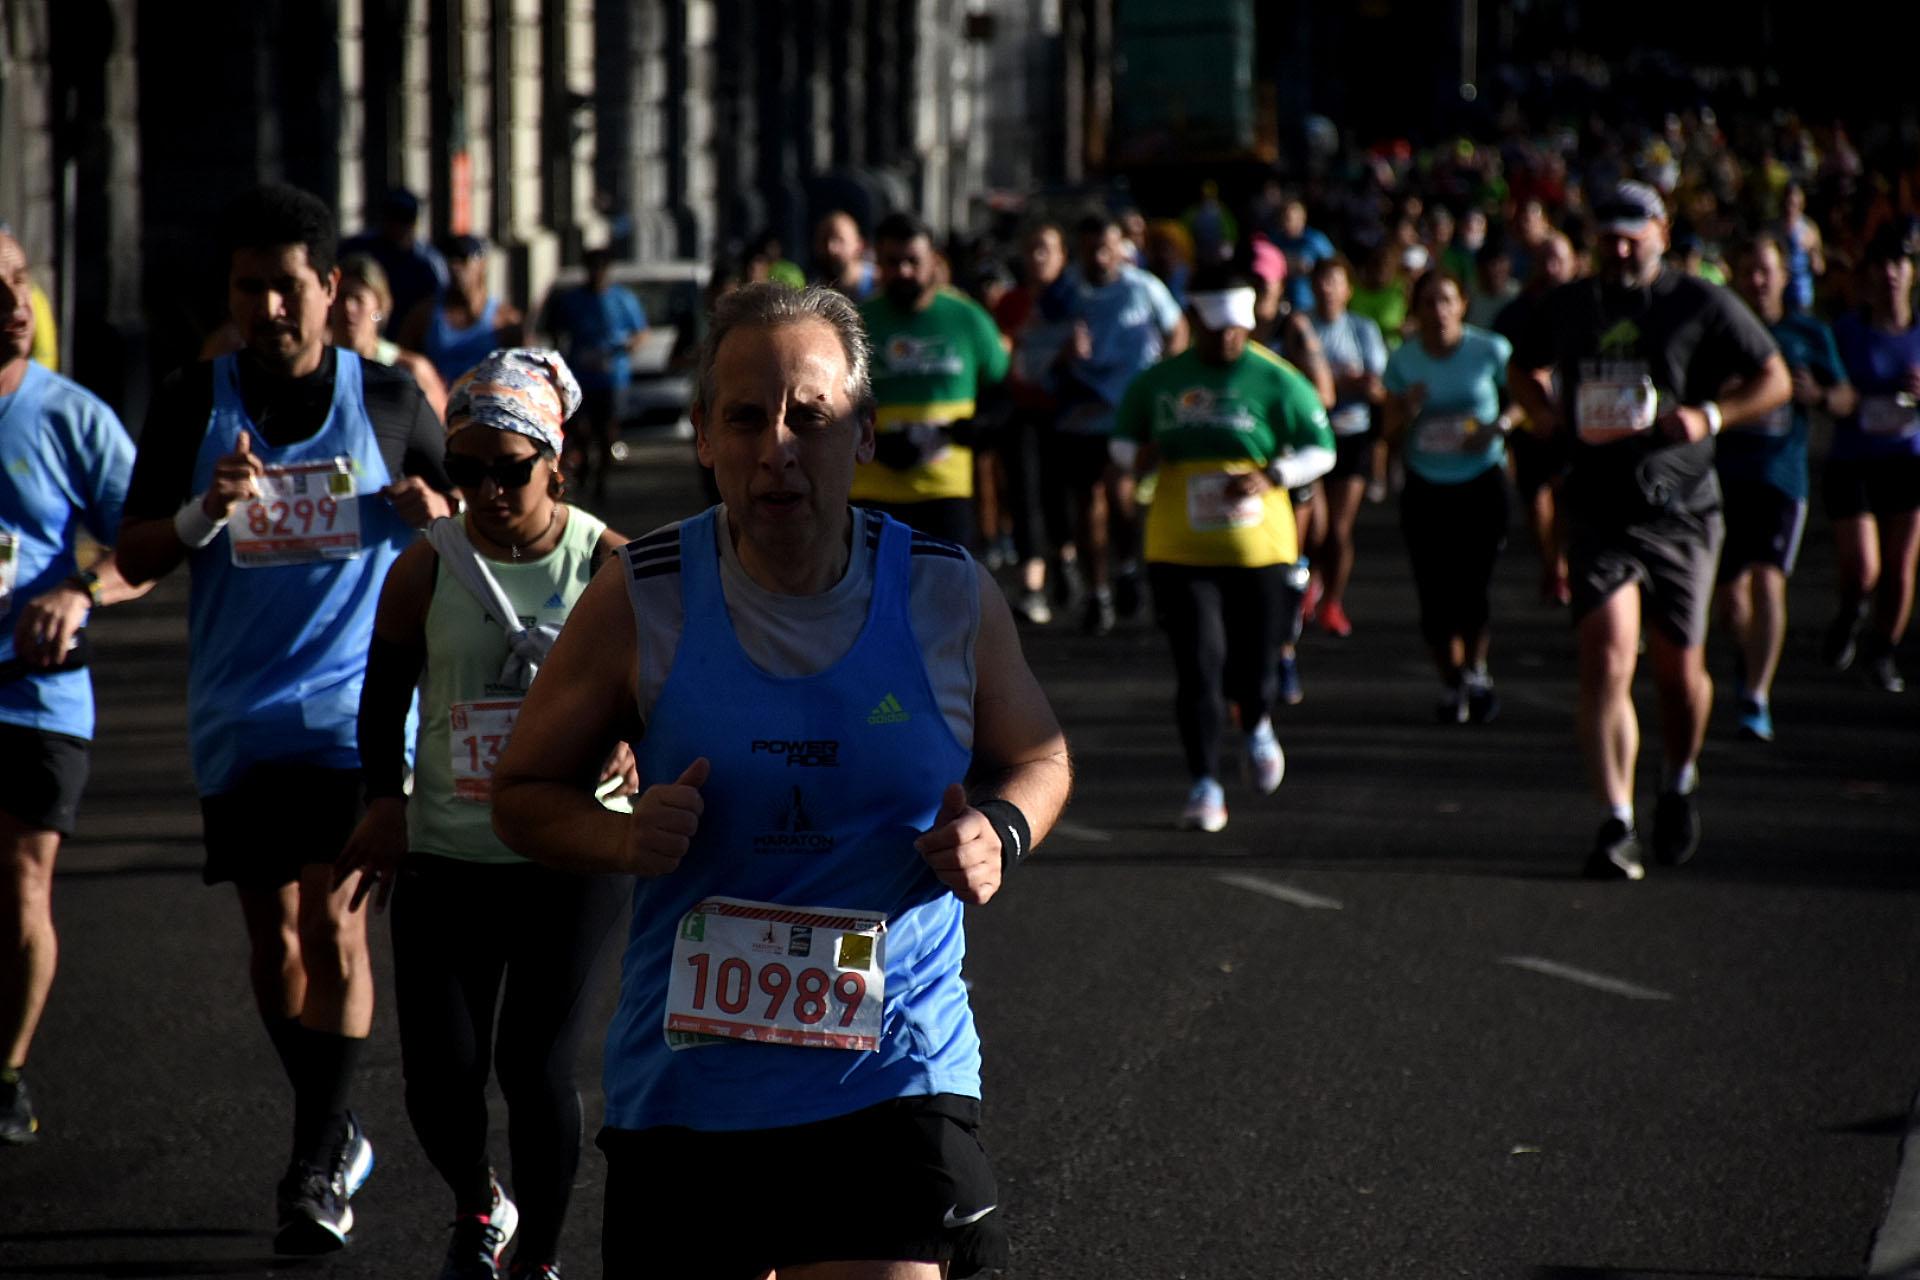 La maratón recibió a participantes de todas las edades